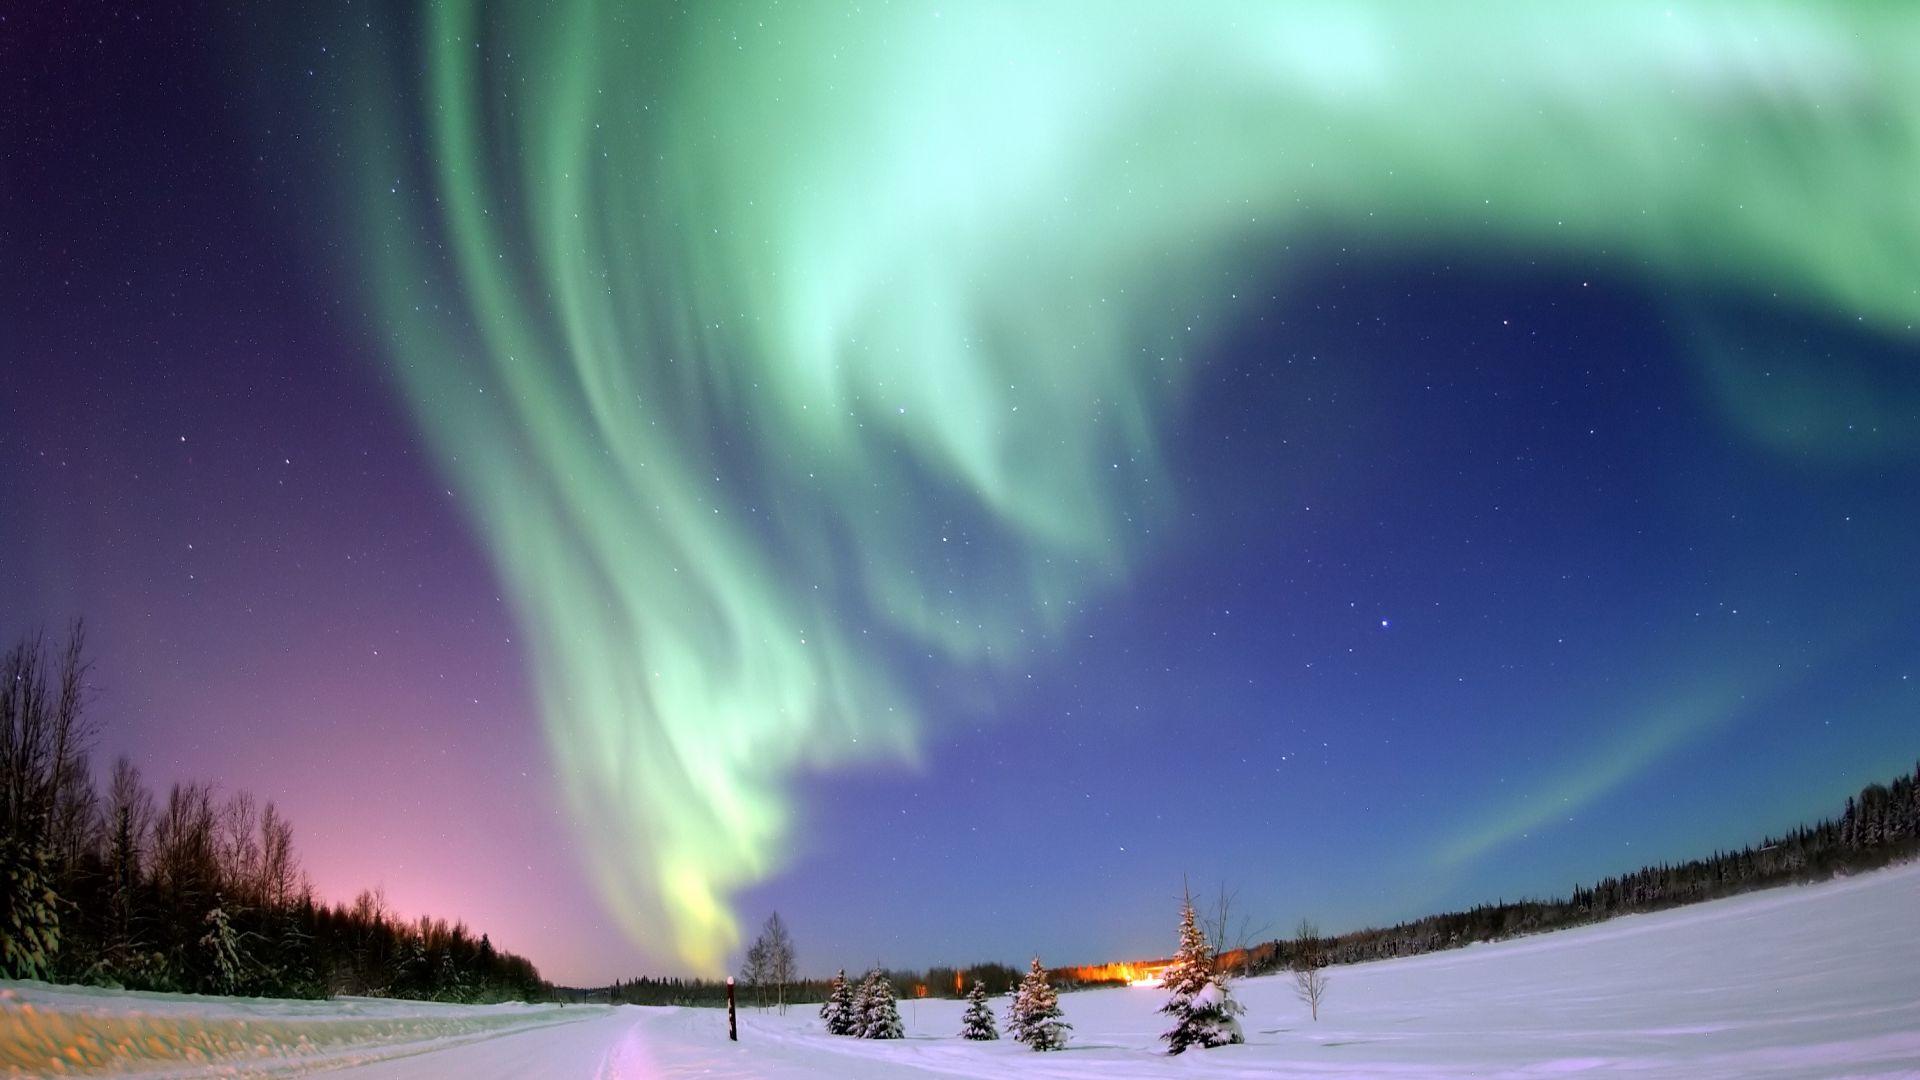 Desktop Wallpaper Green Aurora Northern Lights Of Iceland Hd Image